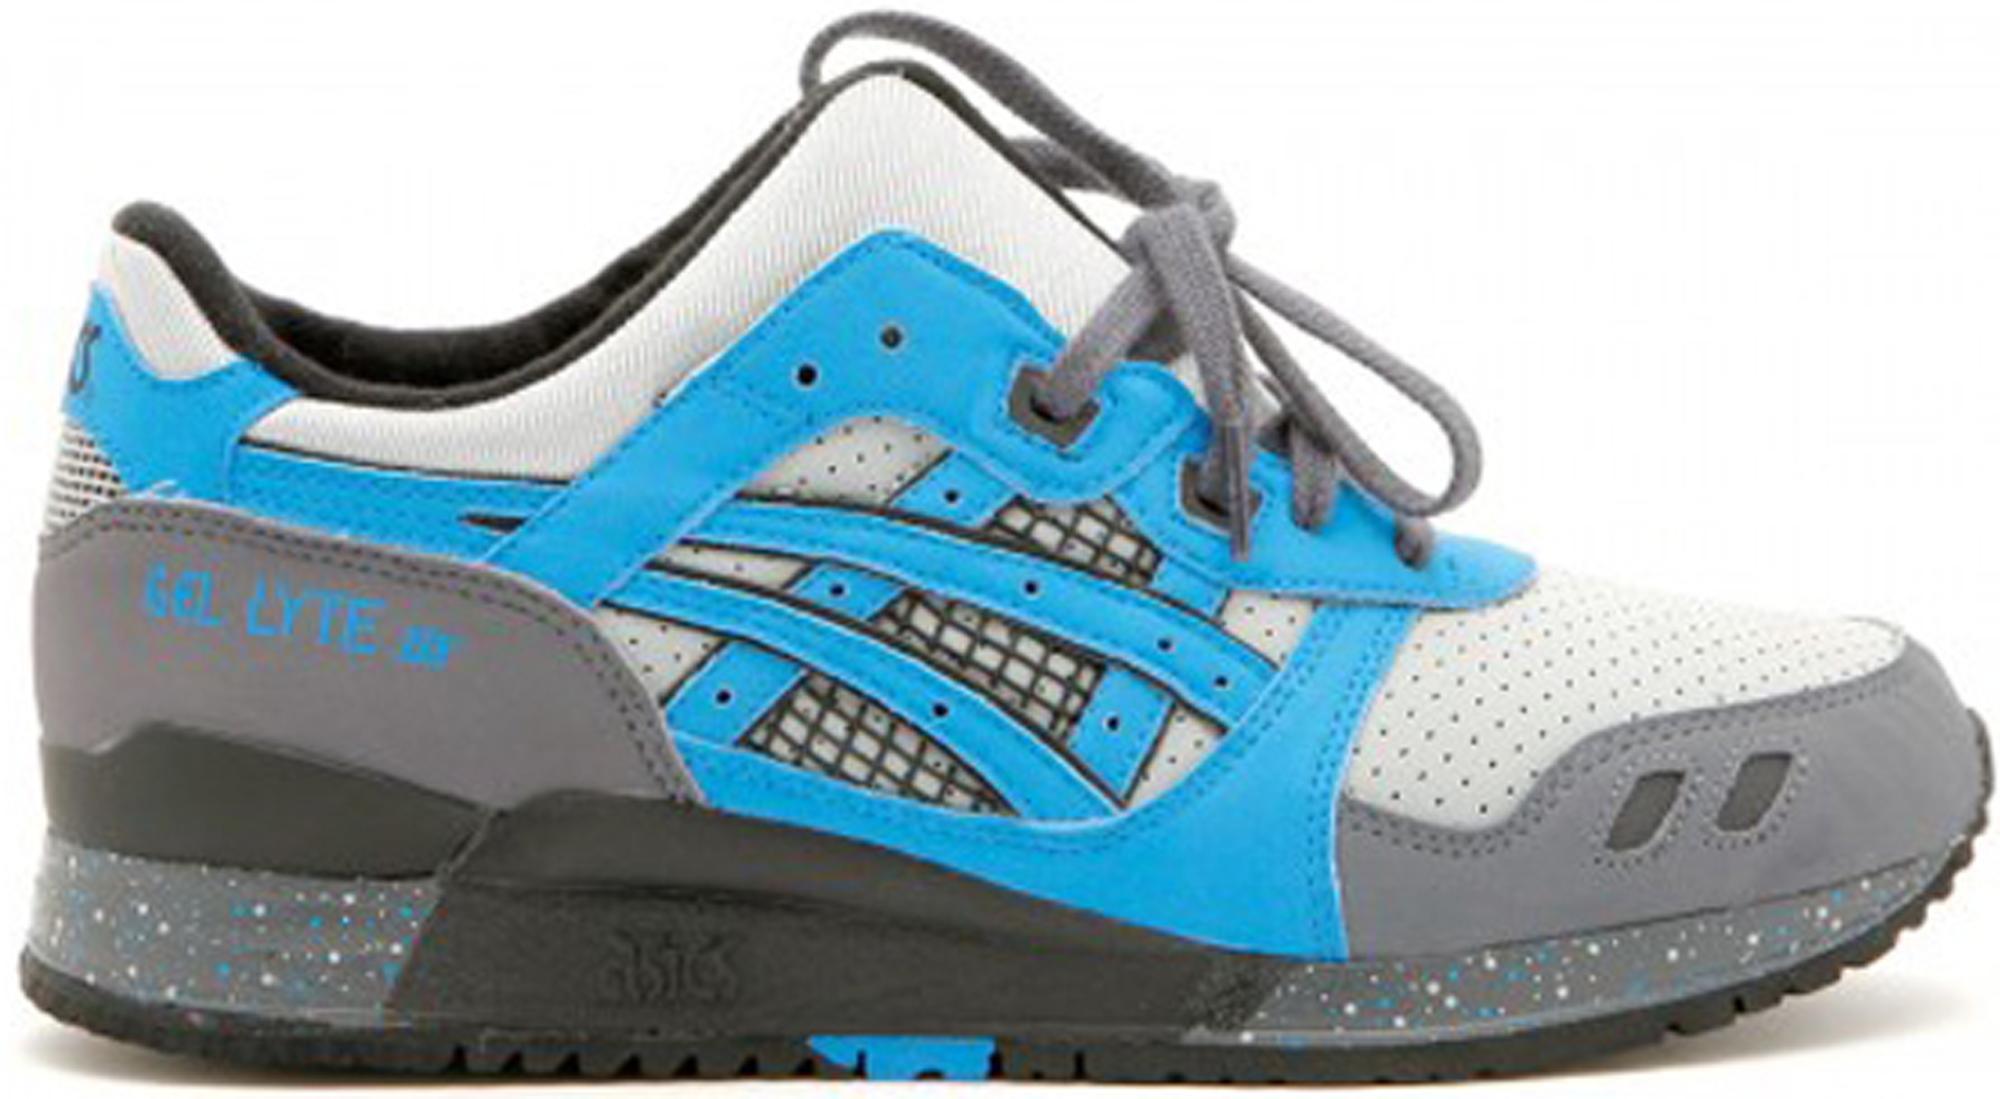 on sale 5a7b7 f6c30 Men's Gel-lyte Iii David Z X Ronnie Fieg Super Blue